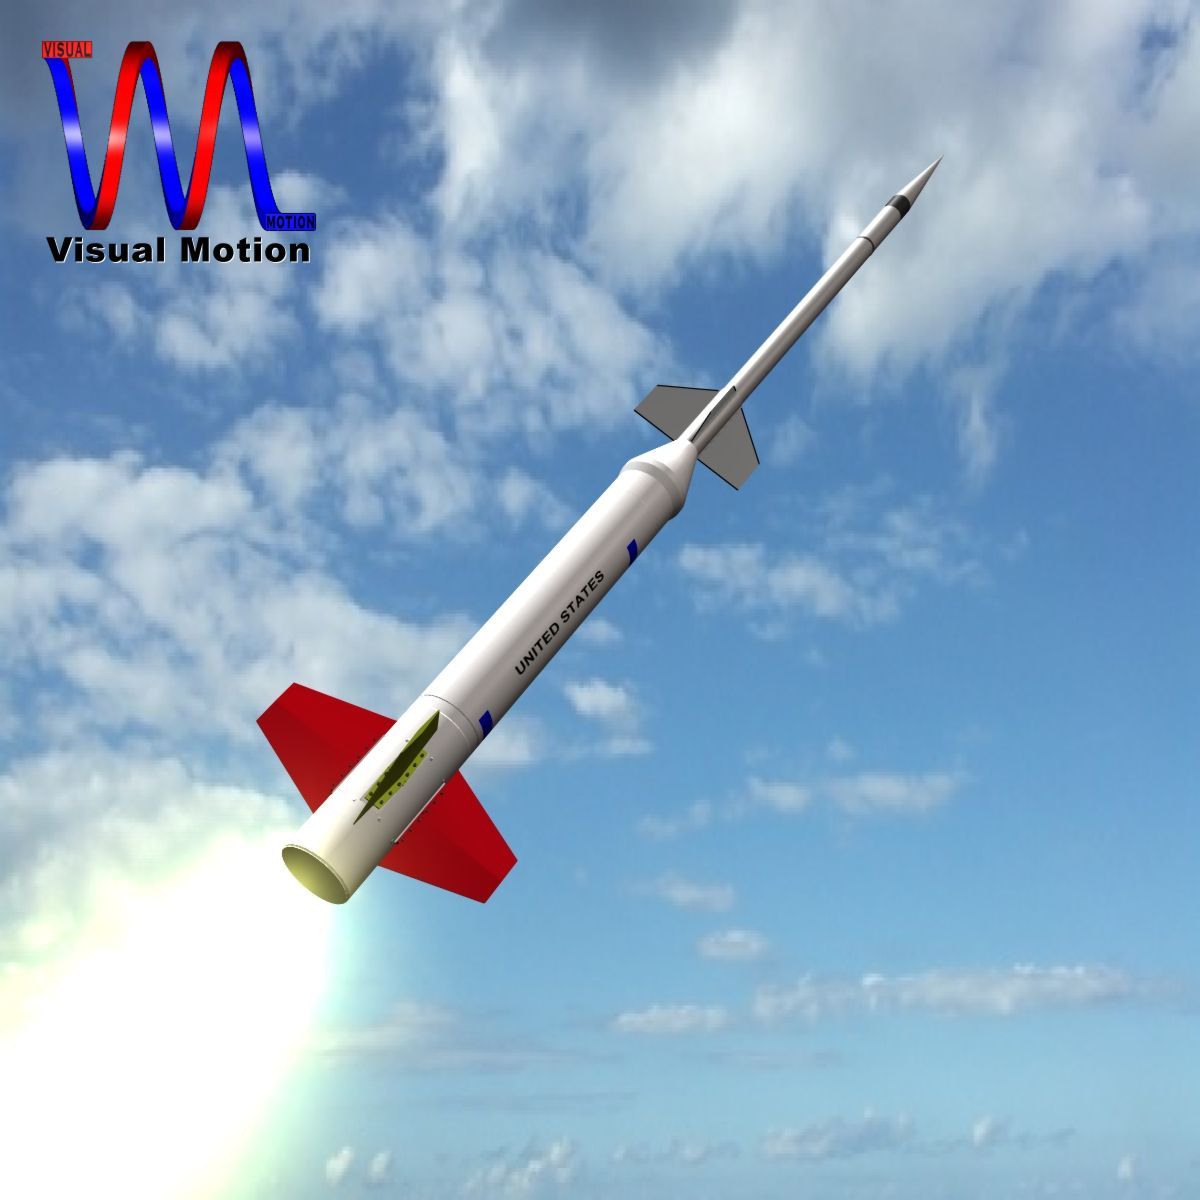 us nike cajun raketa 3d model 3ds dxf x cod scn obj 149286